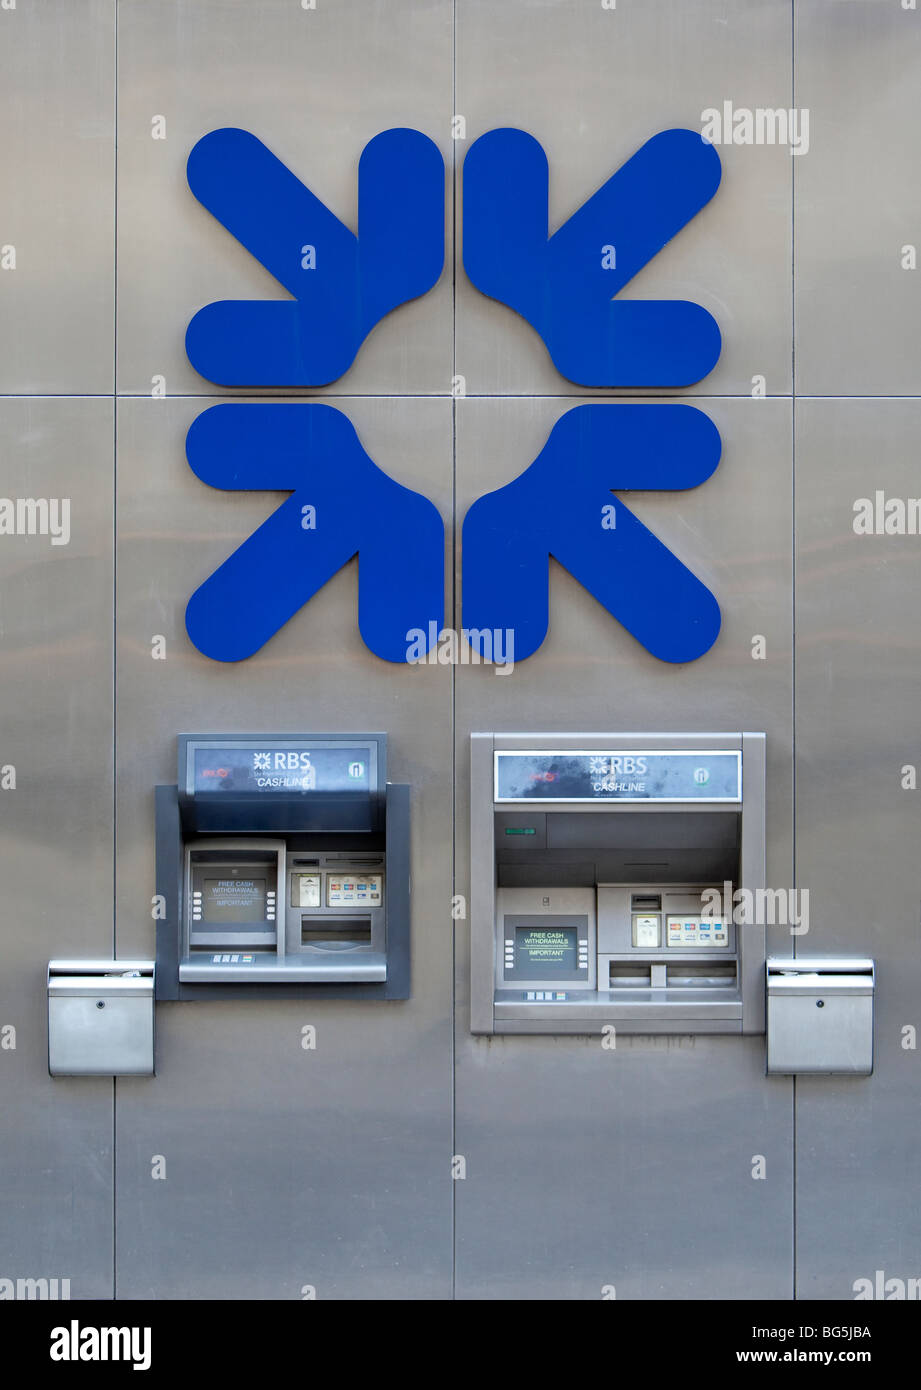 Royal bank of Scotland RBS sign/logo - Stock Image